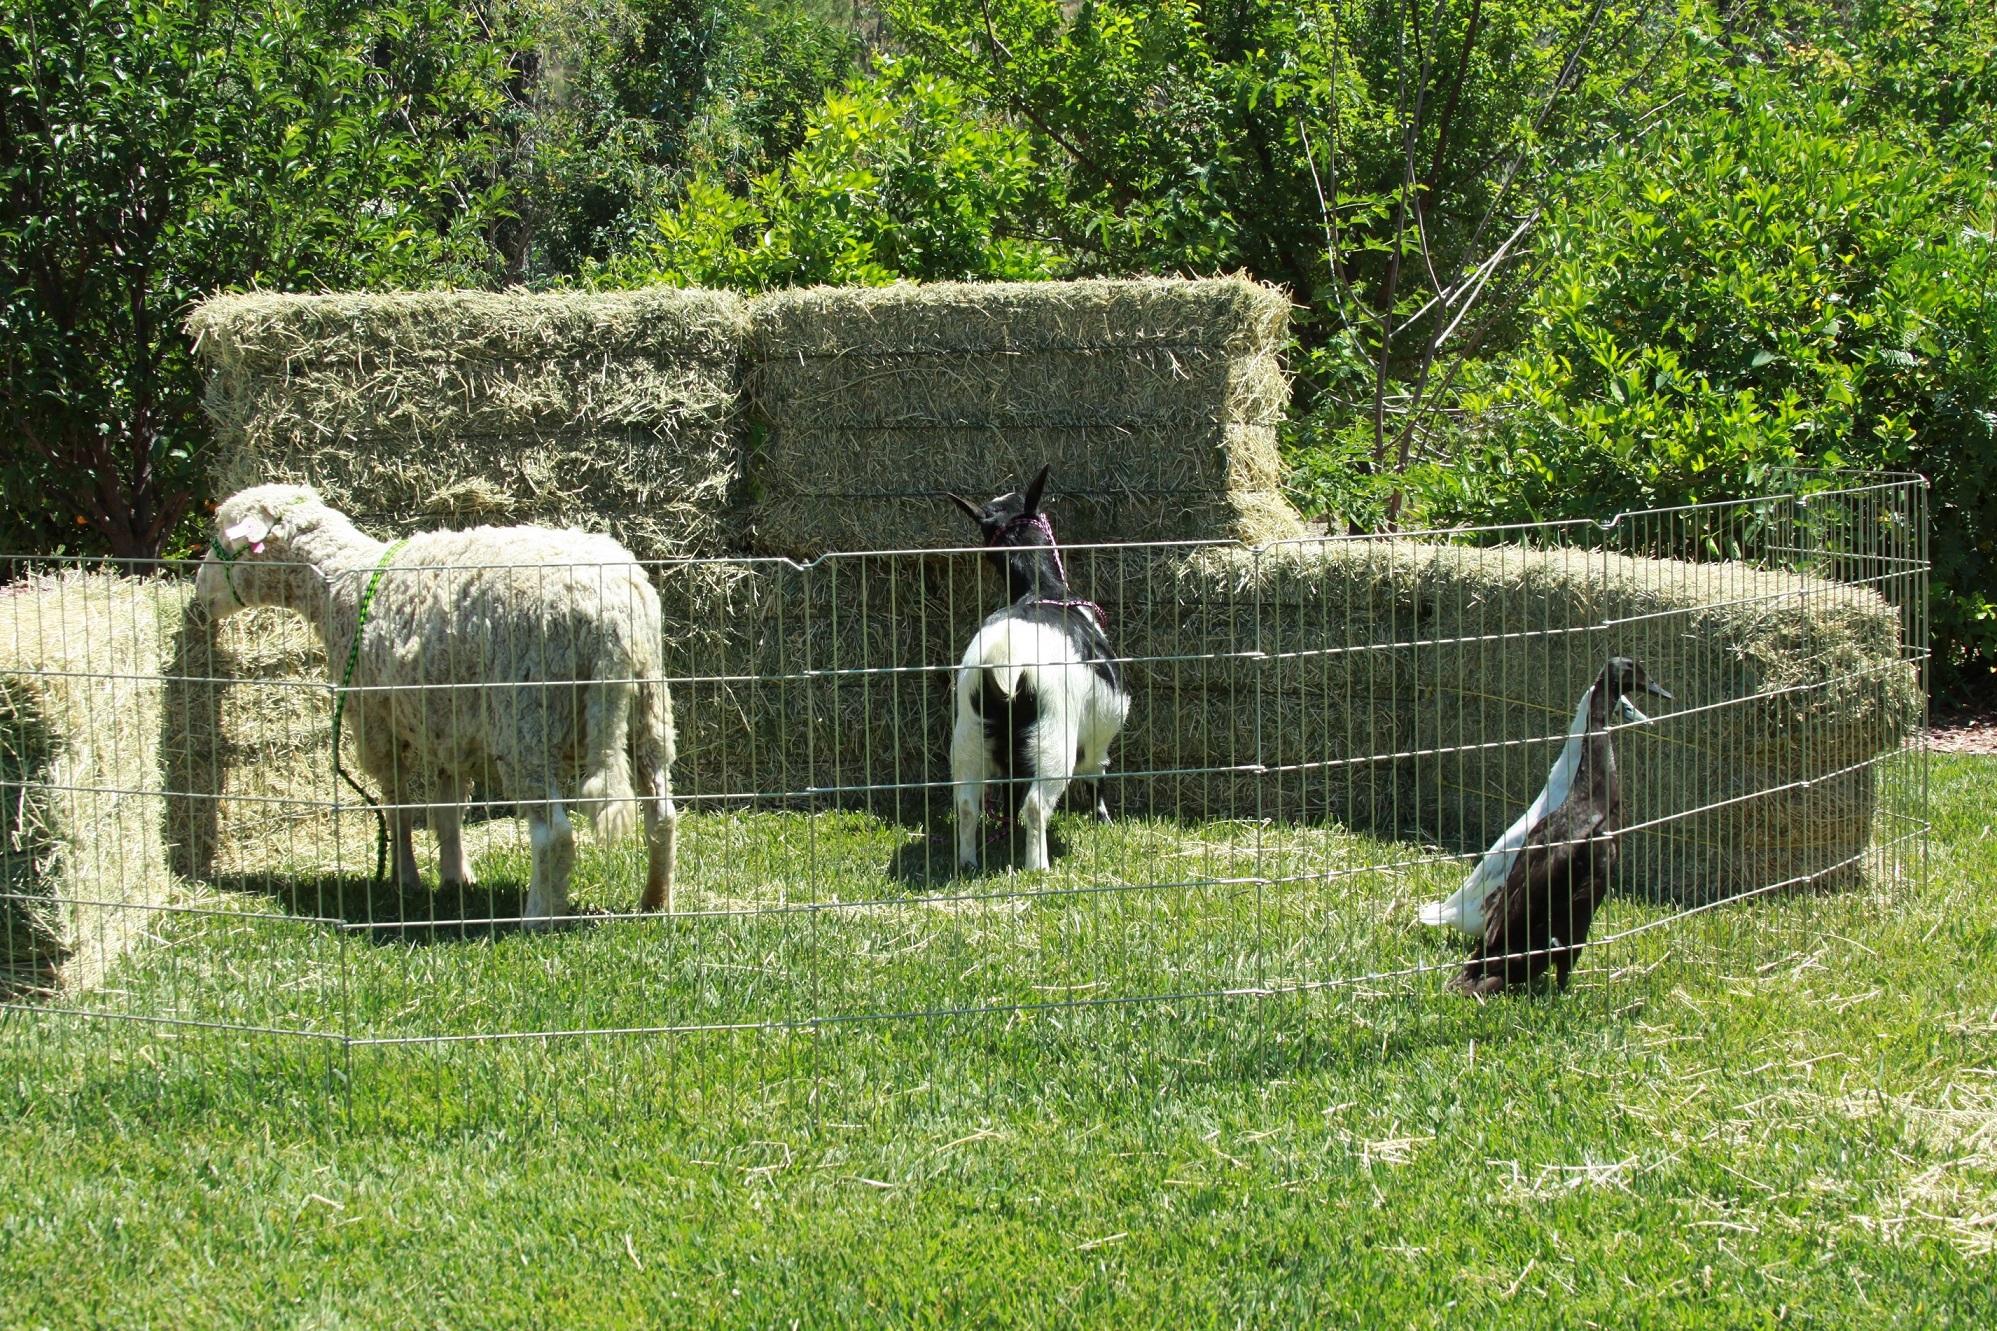 Bandy Canyon - Petting Zoo